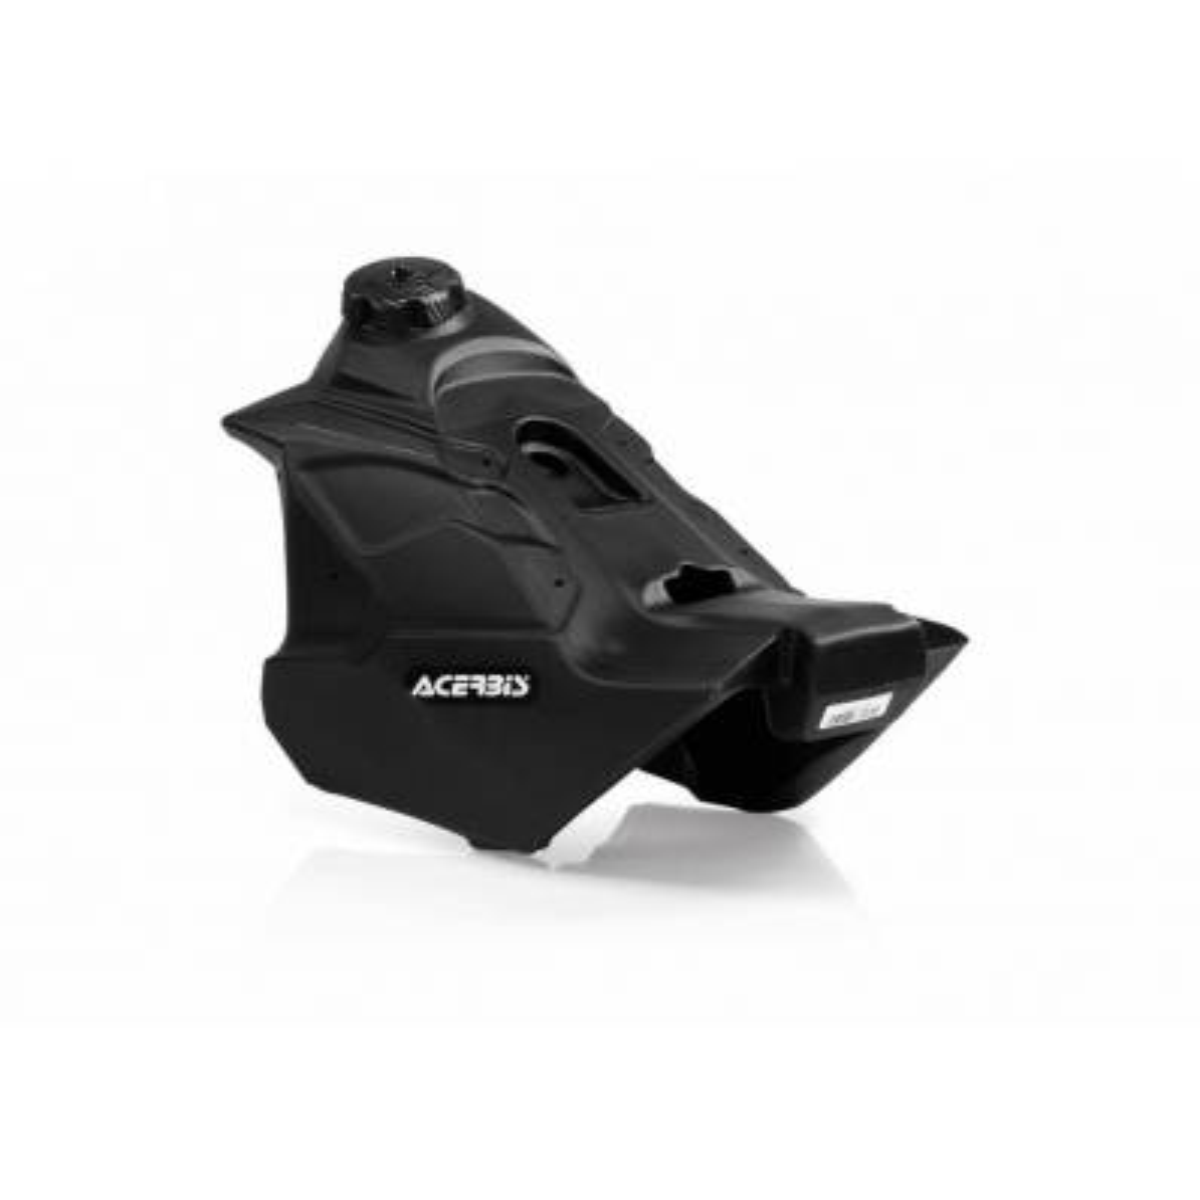 Depósito Acerbis KTM EXC/EXCF 08-11 SX/SXF 07-10 11Litros NEGRO